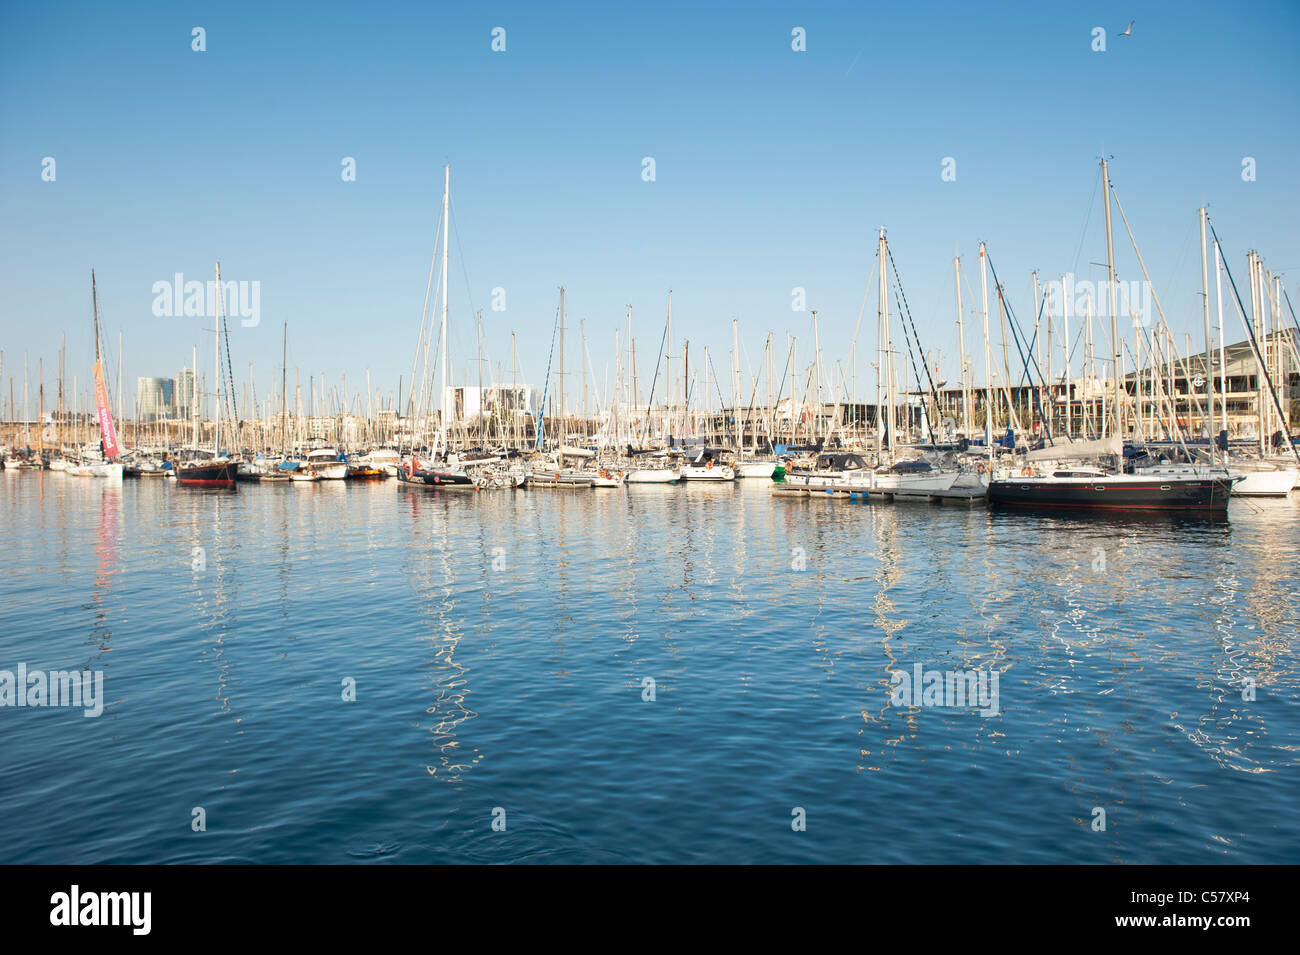 View of the anchored boats at the Barcelona Marina Harbor (Moll de la Fusta), Spain - Stock Image